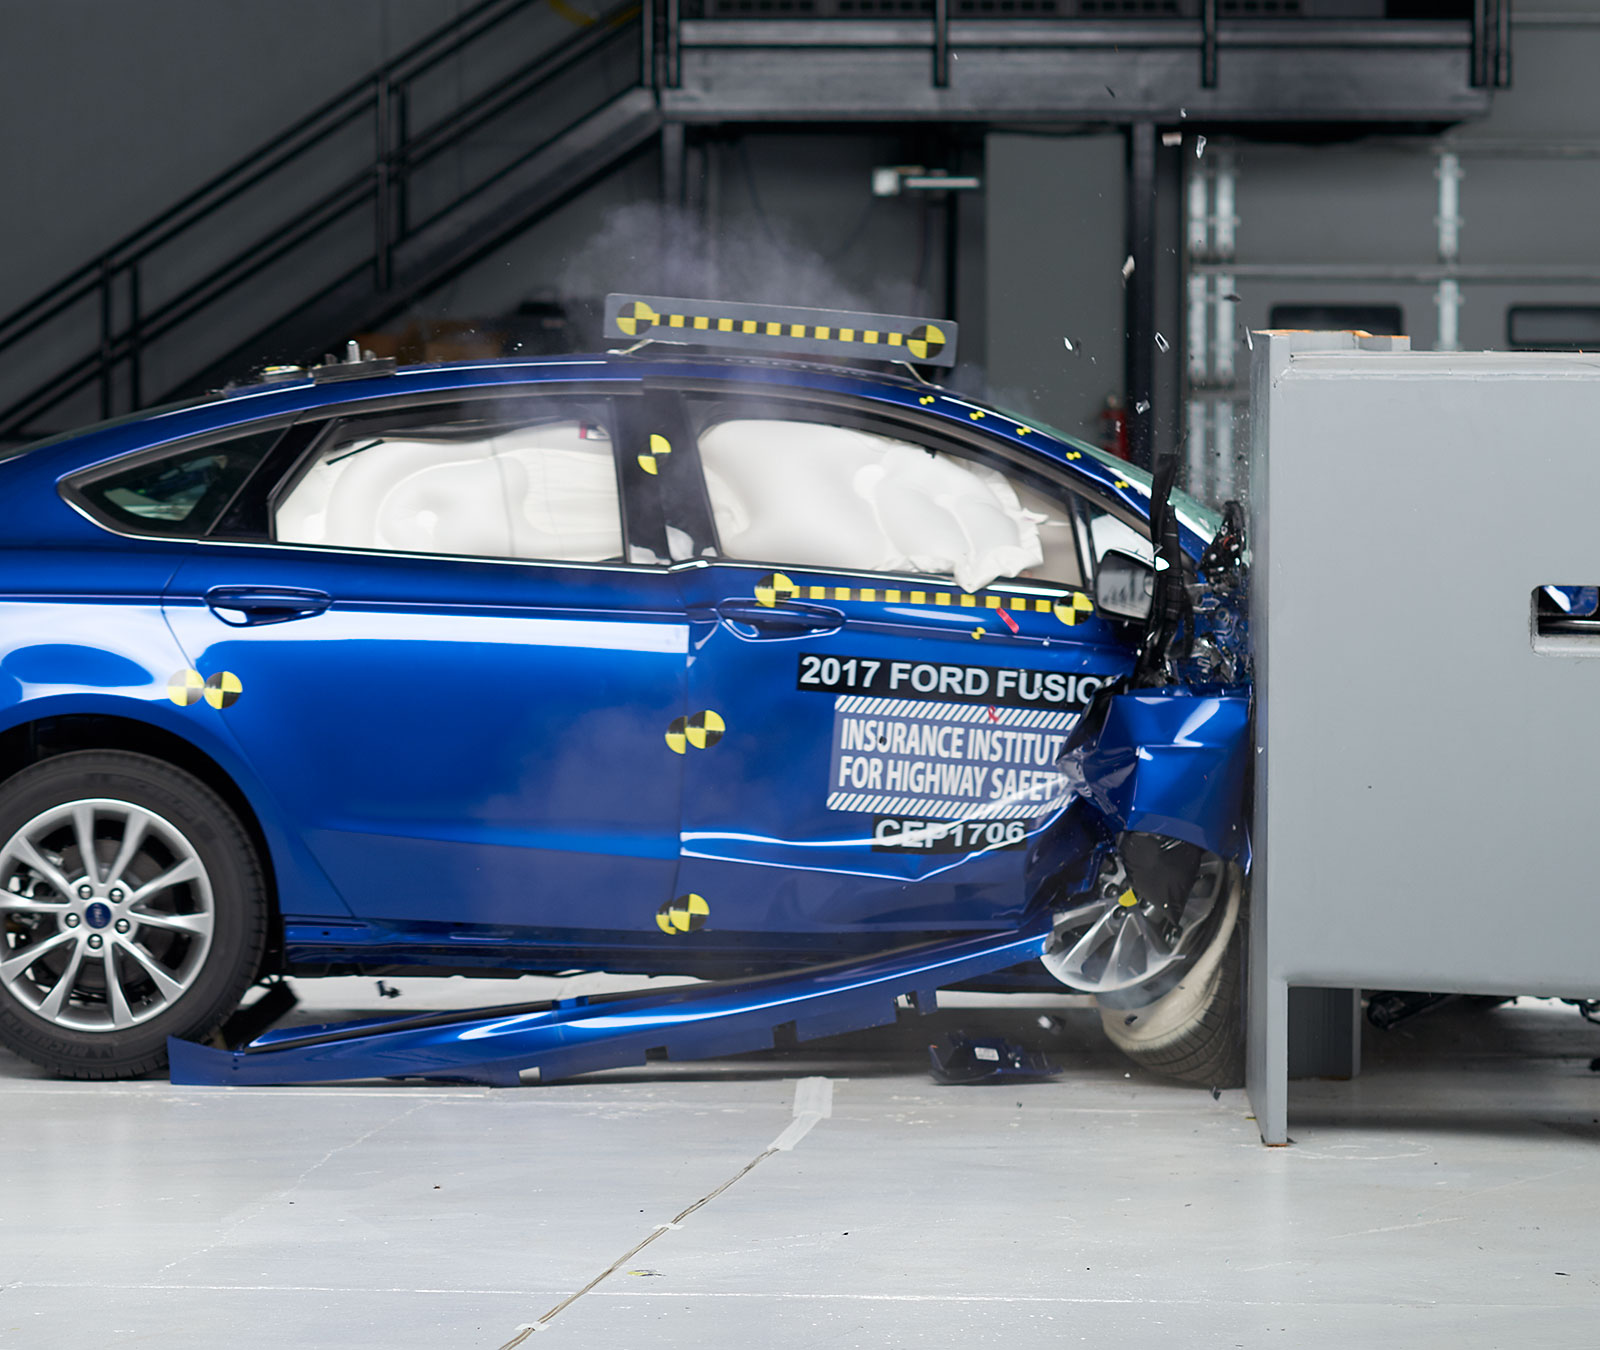 Action Shot Taken During The Penger Side Small Overlap Frontal Crash Test